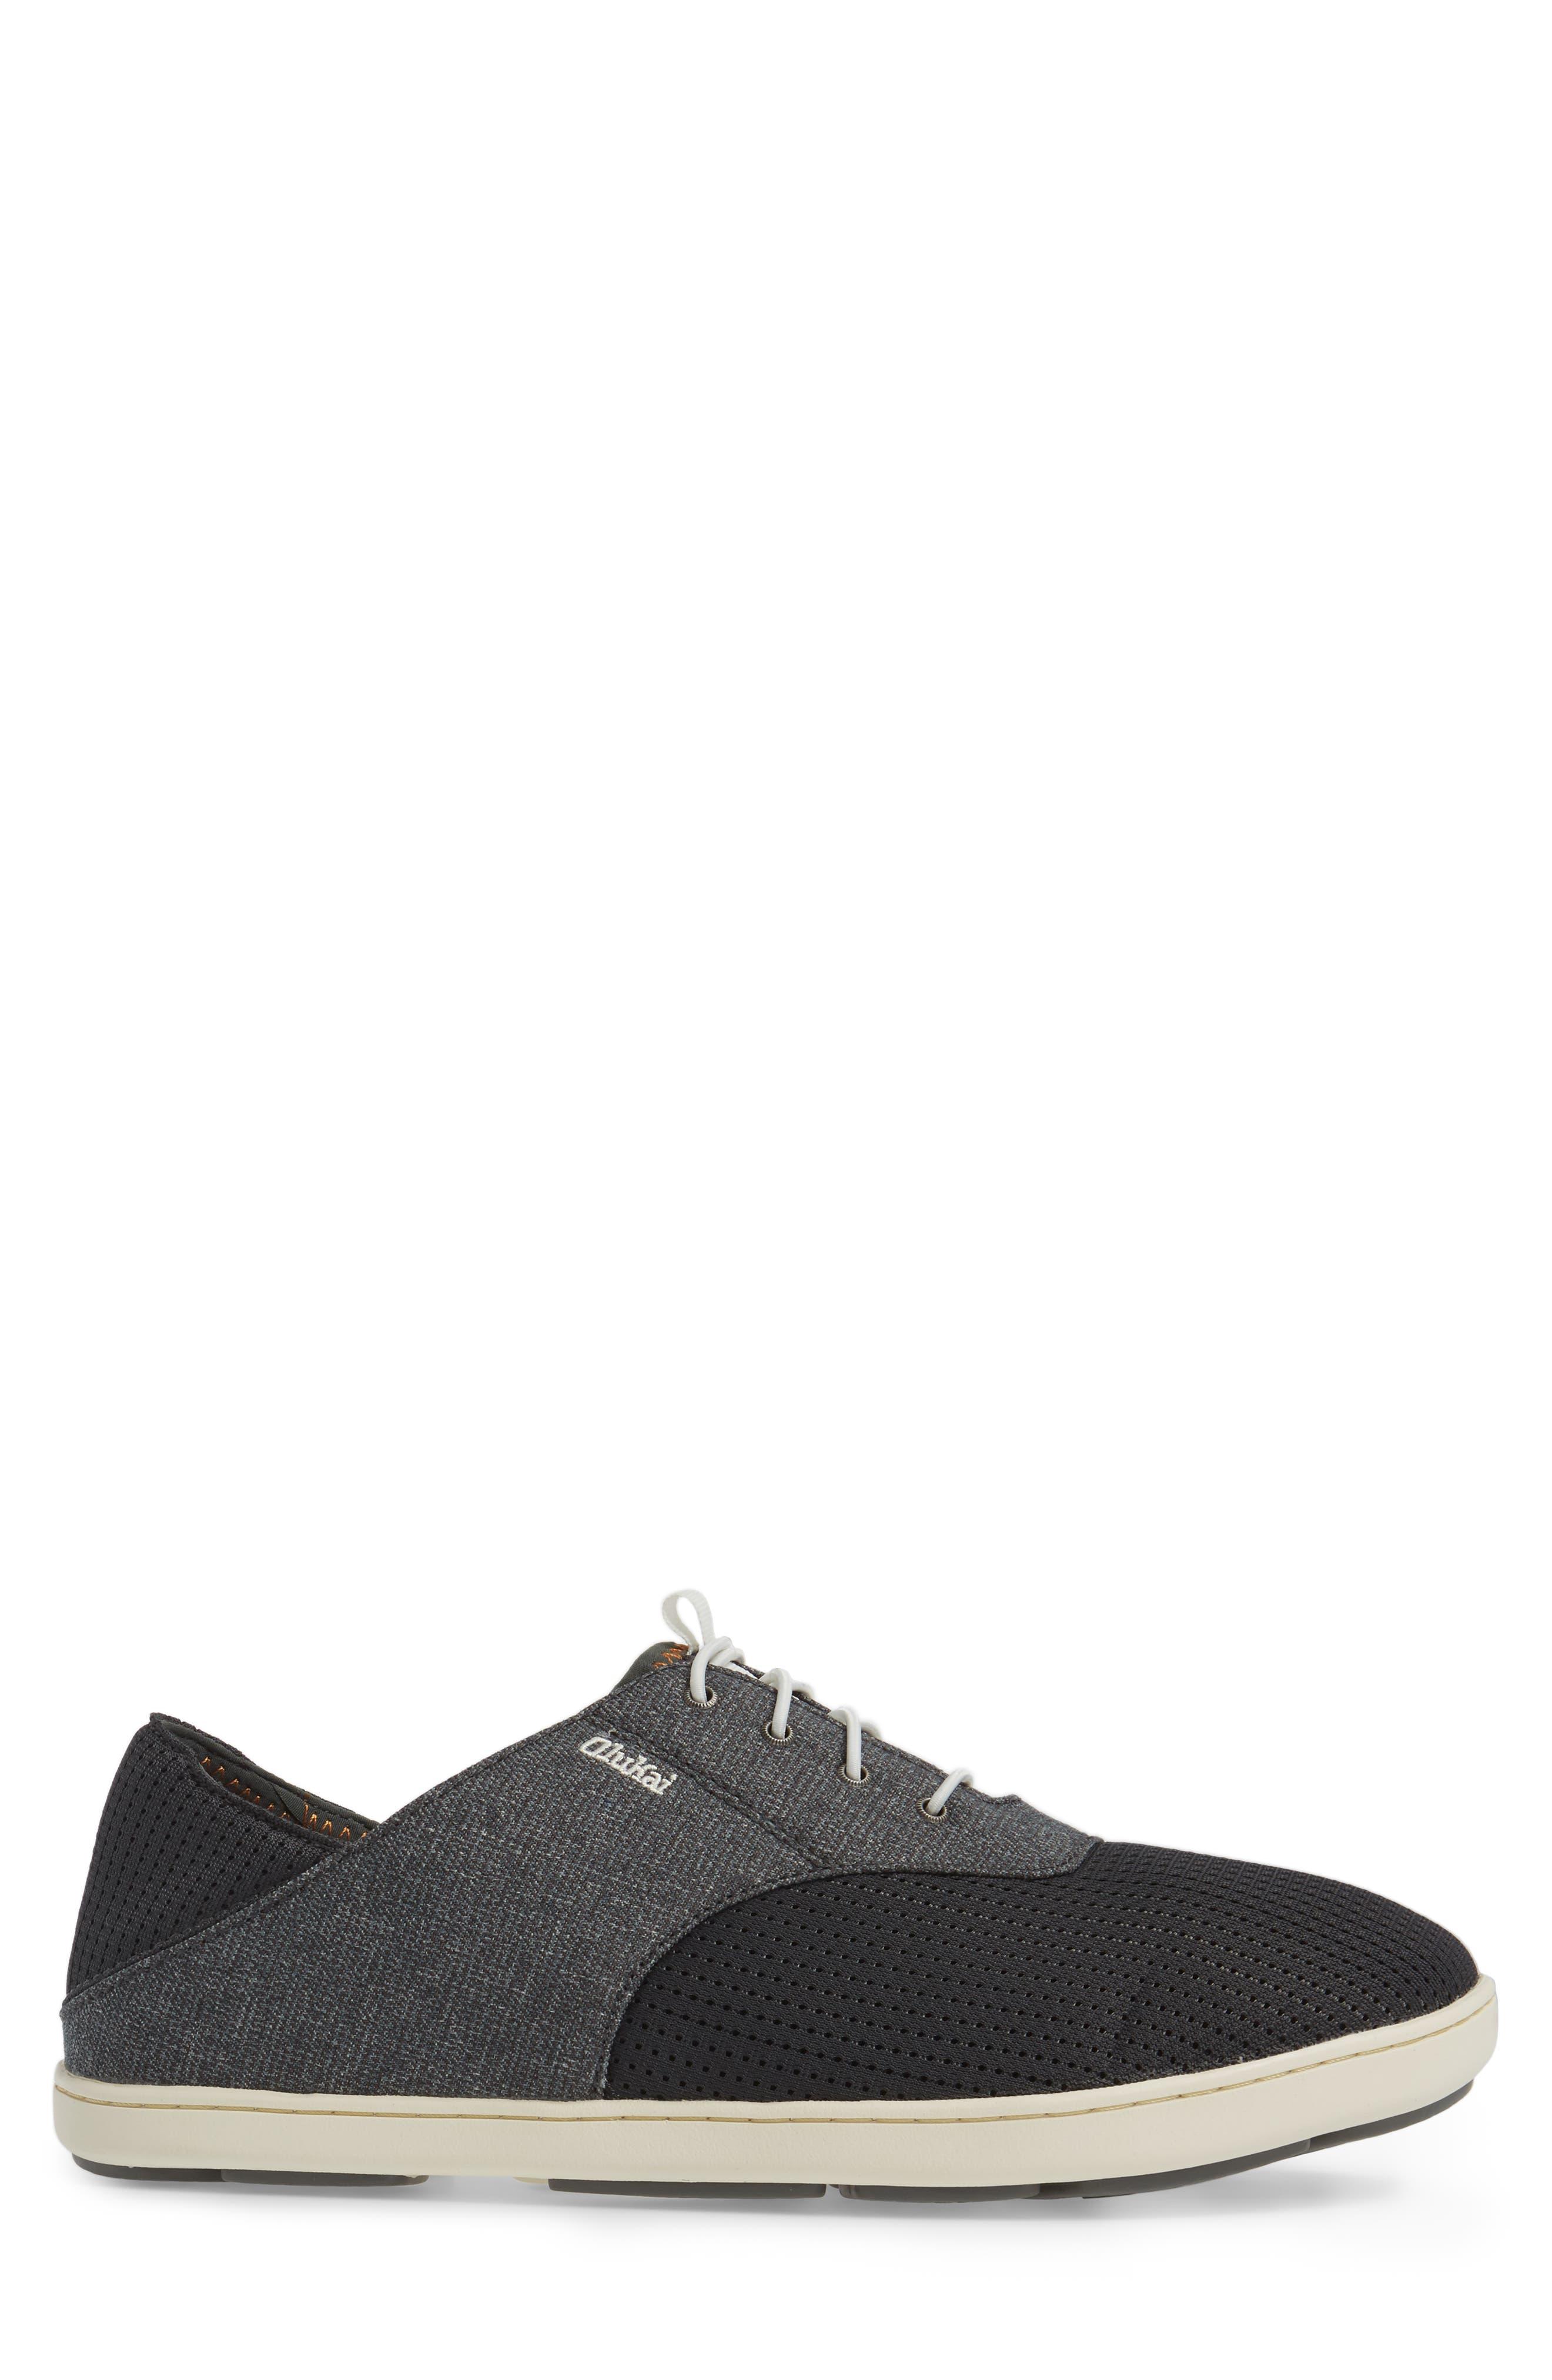 'Nohea Moku' Sneaker,                             Alternate thumbnail 3, color,                             Dark Shadow/ Dark Shadow